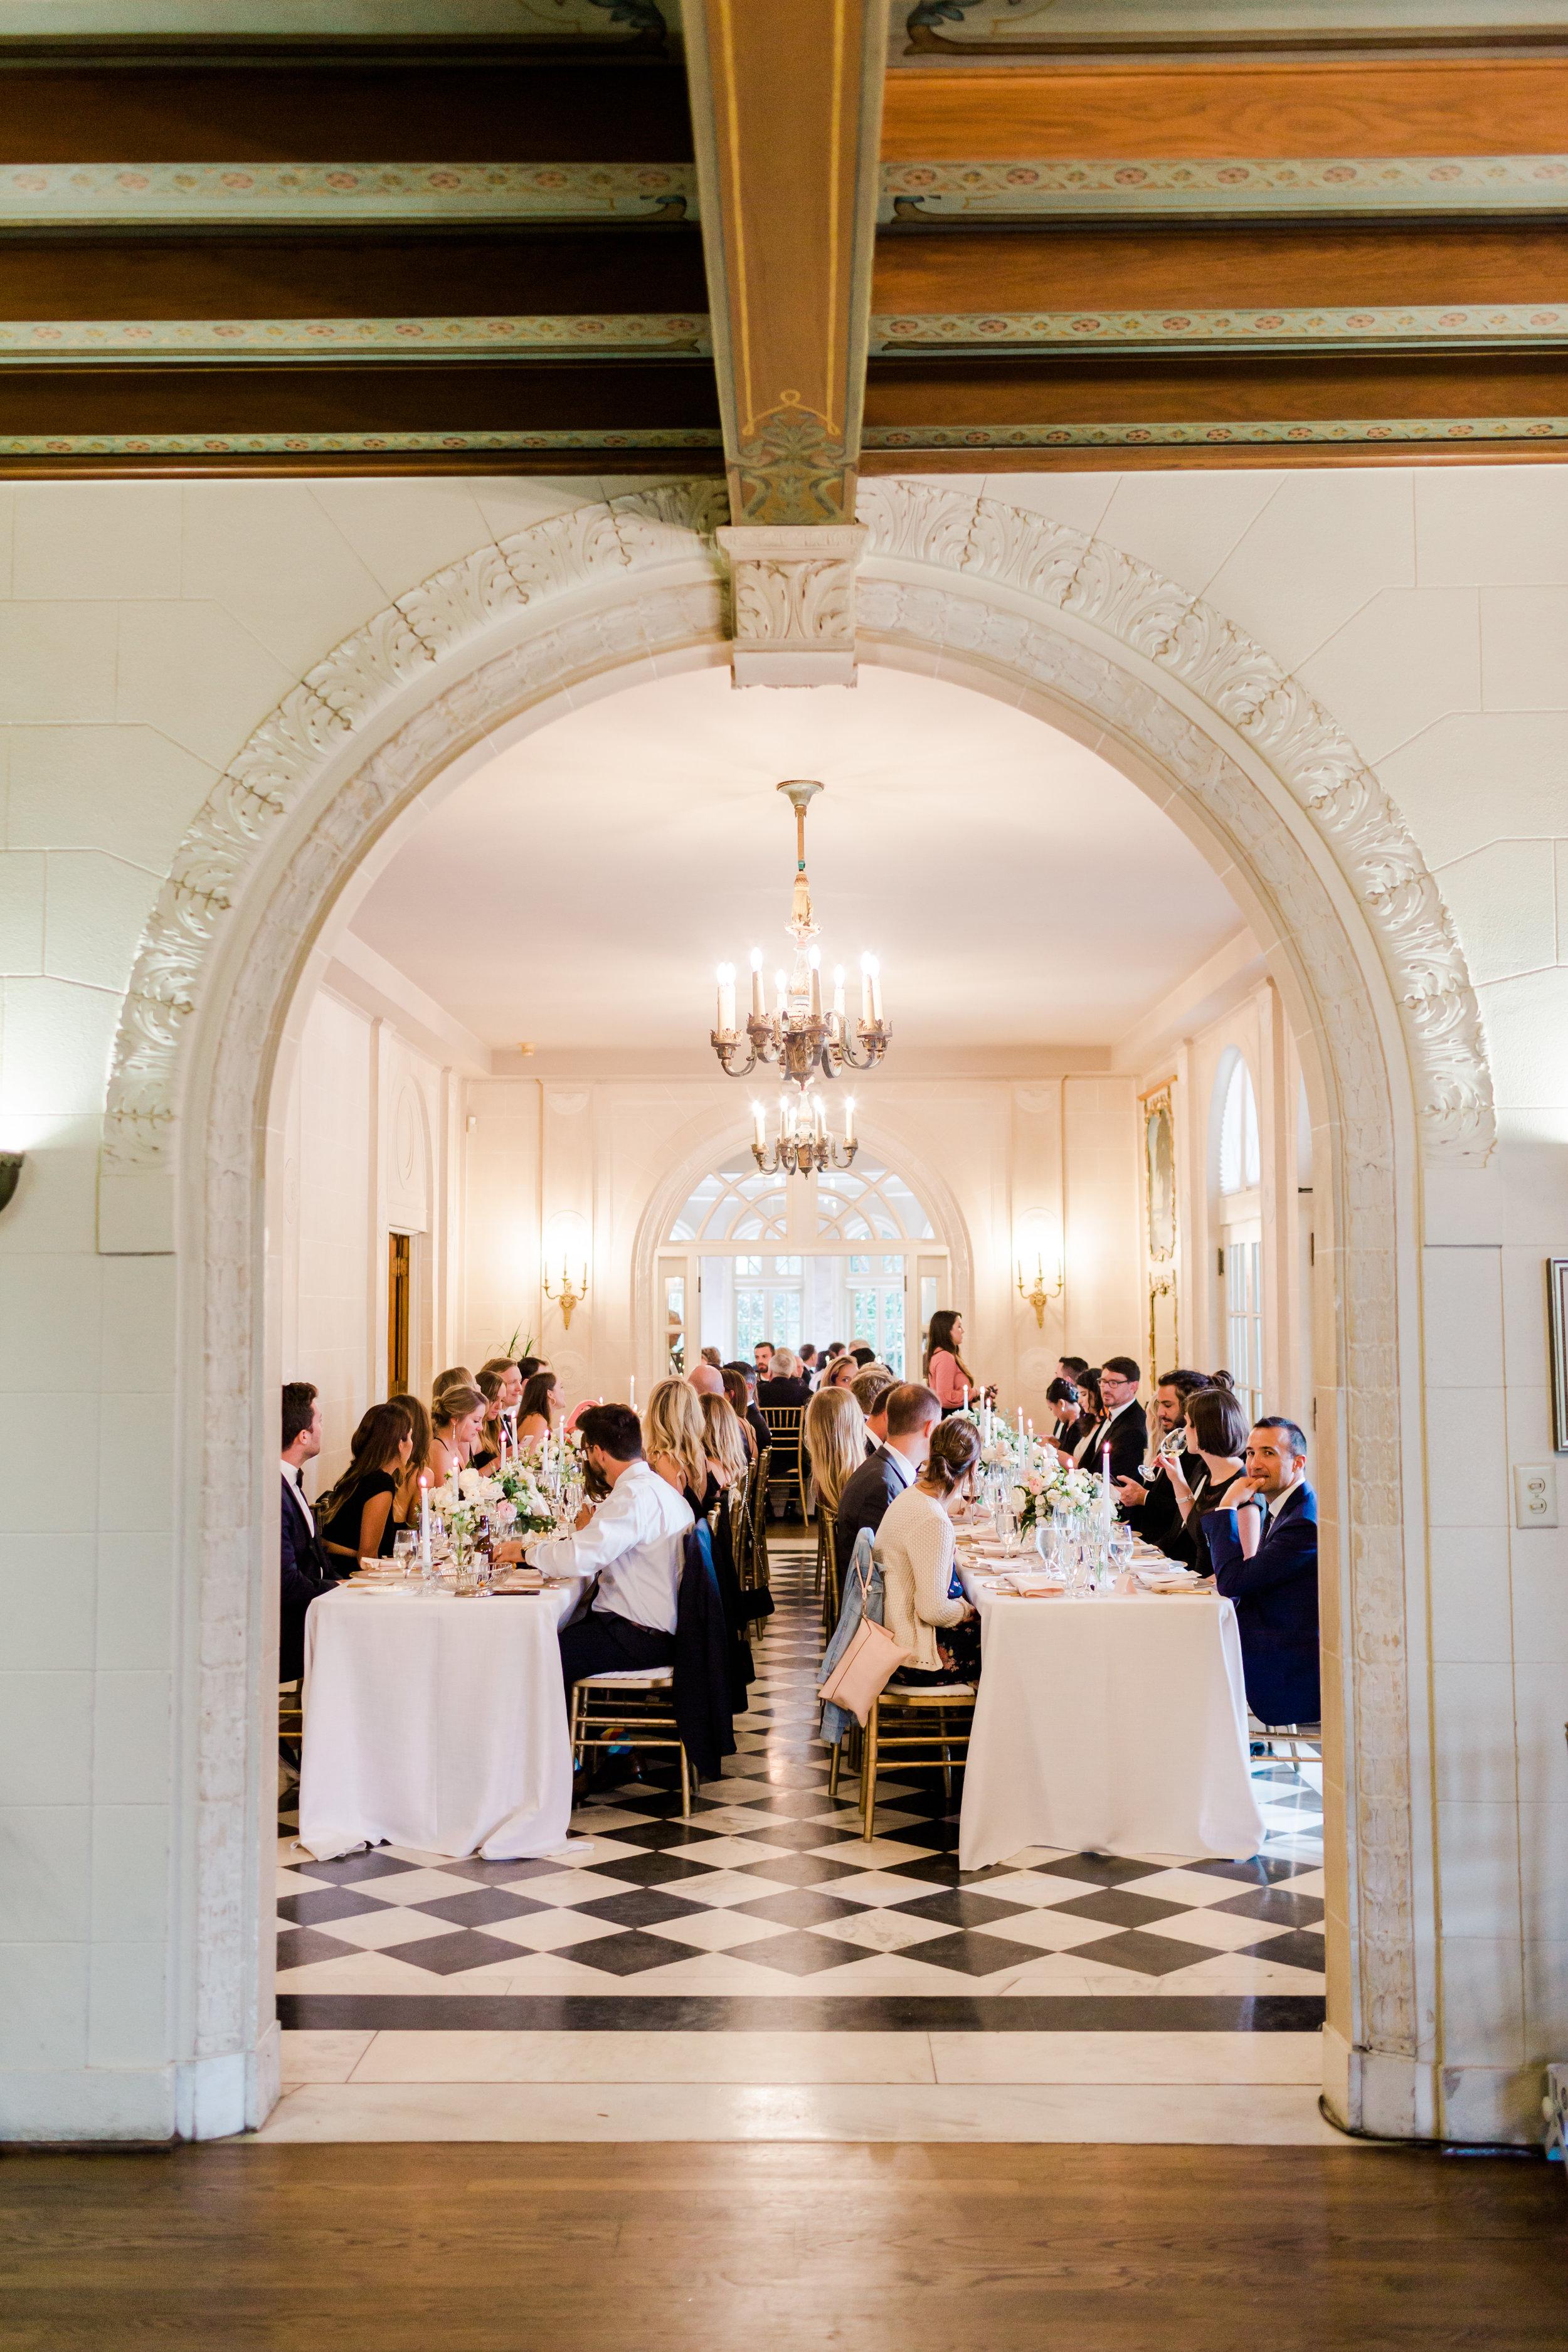 The Mansion at Woodward Park Tulsa Oklahoma Wedding_Valorie Darling Photography-6553.jpg